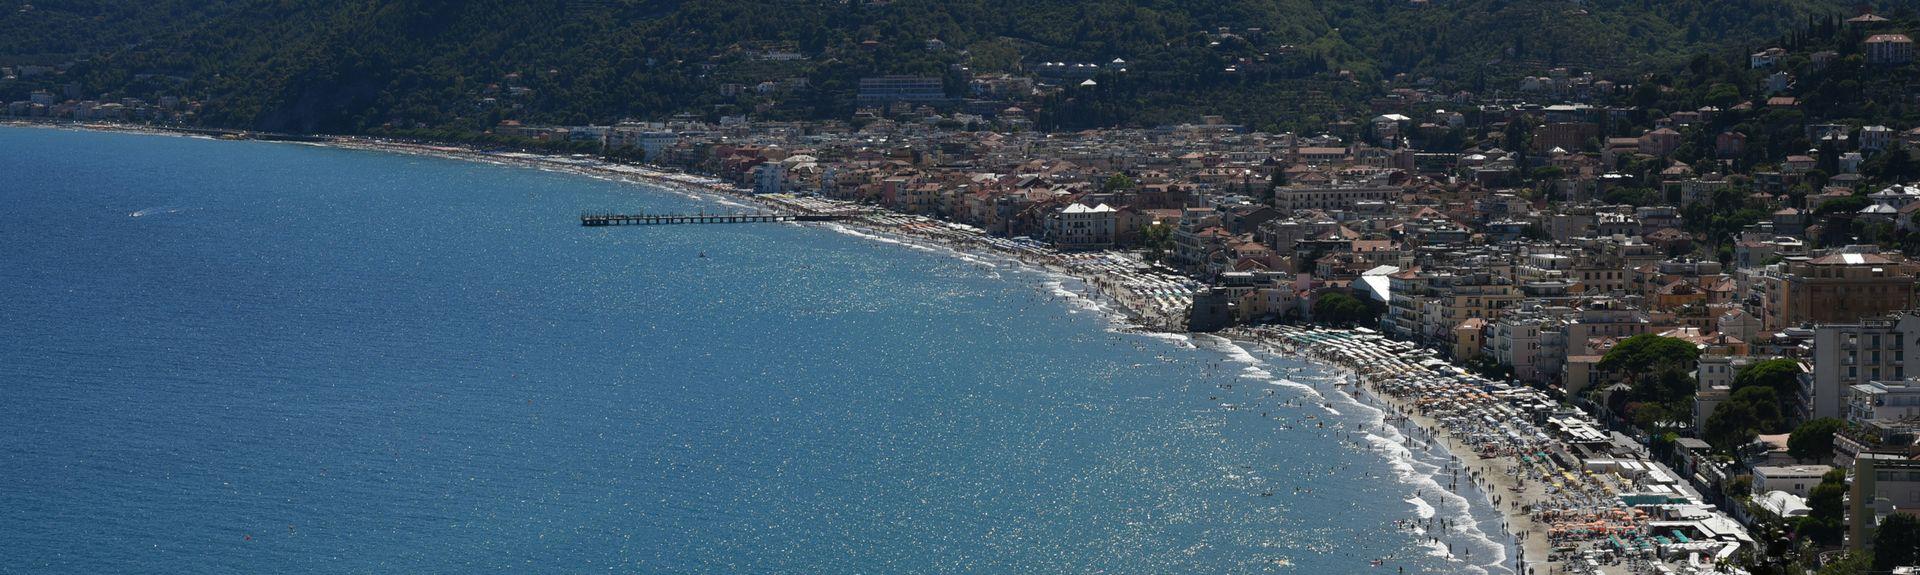 Cisano Sul Neva, Province of Savona, Liguria, Italy